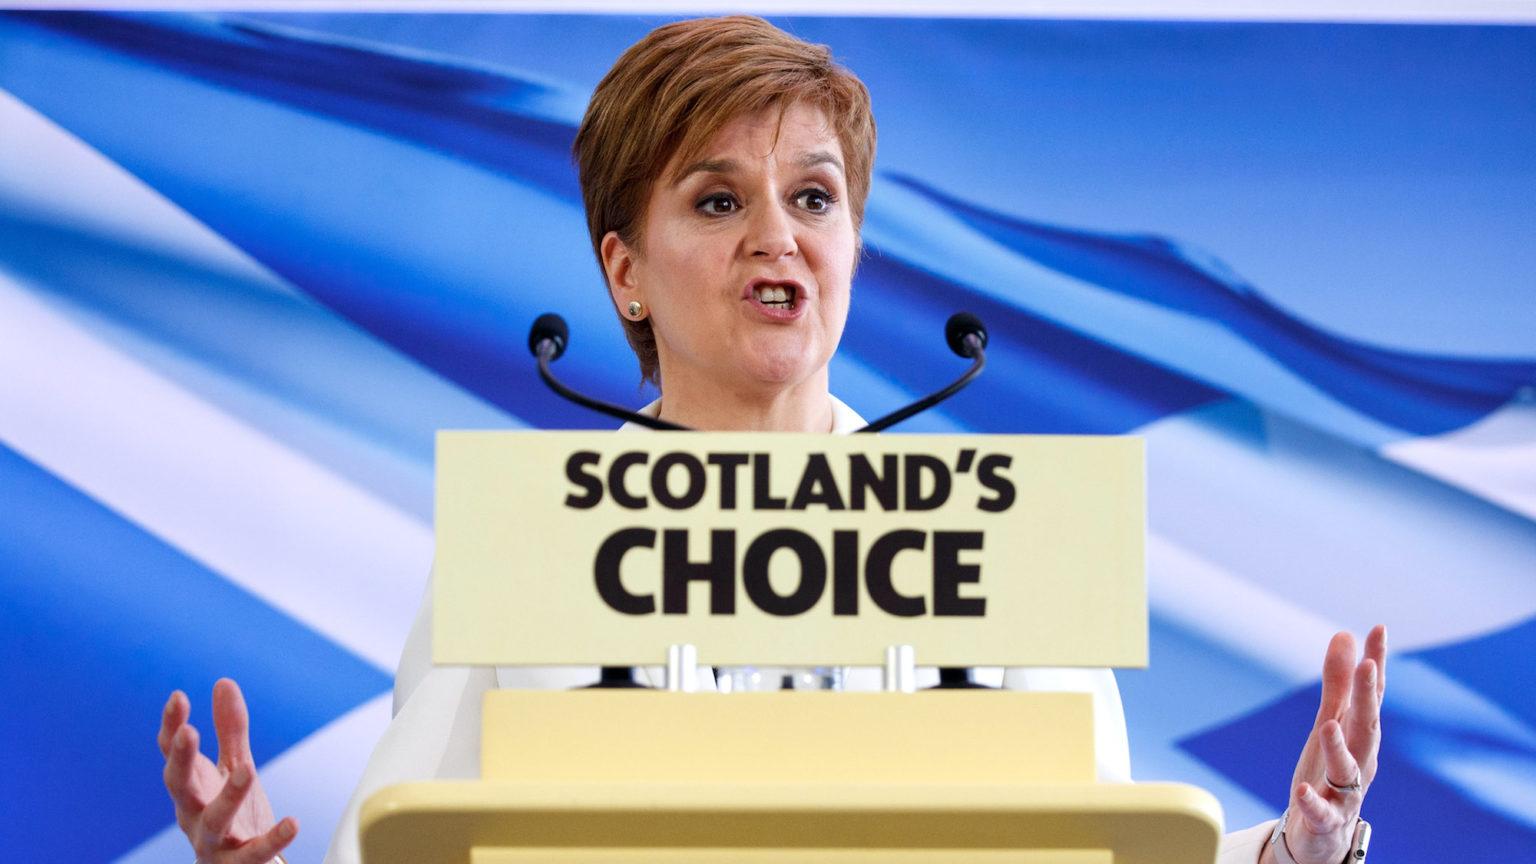 The SNP's European nightmare